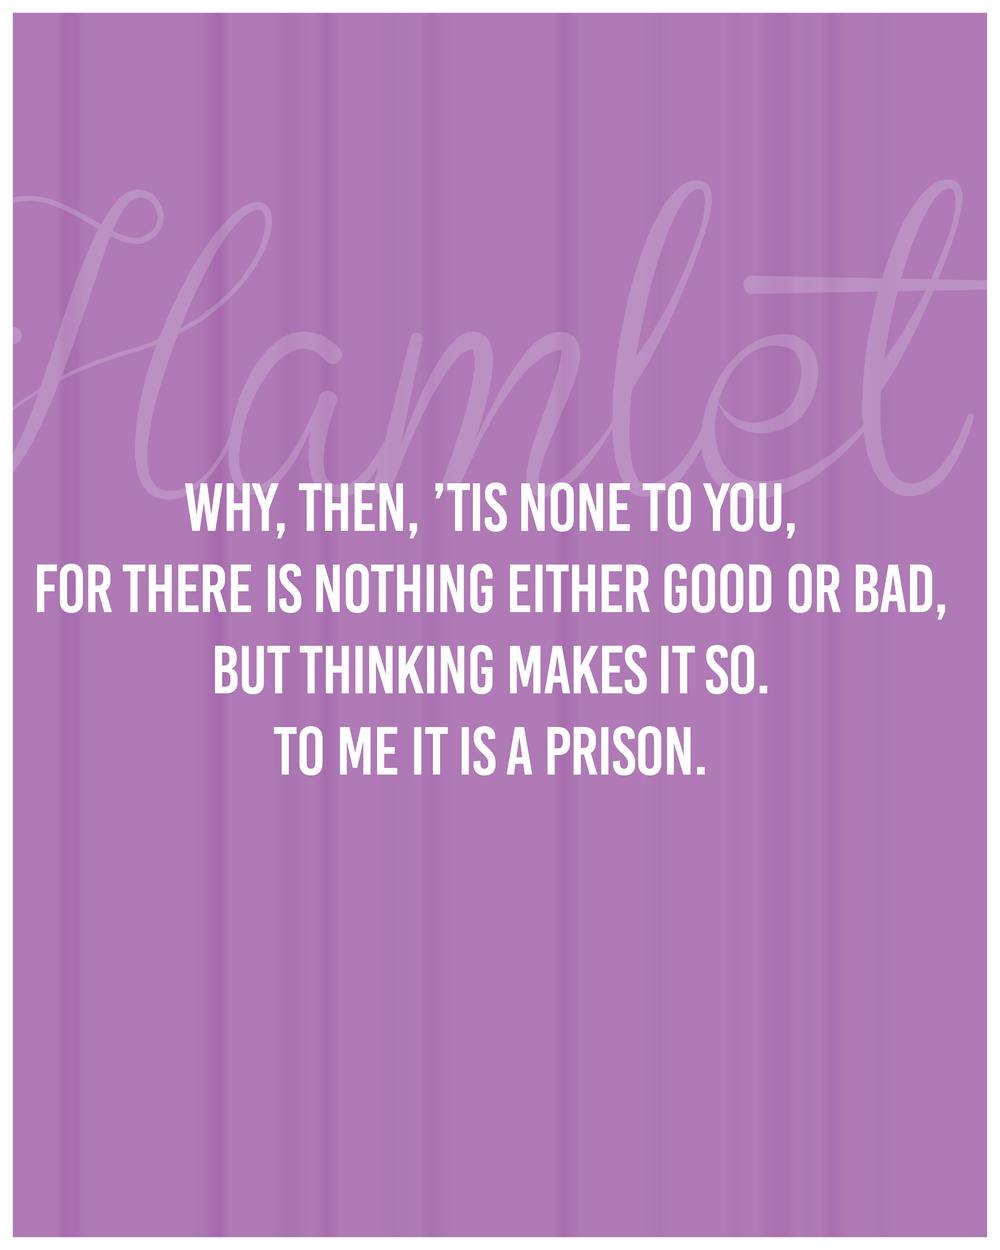 Hamlet Posters ACT II-04.png